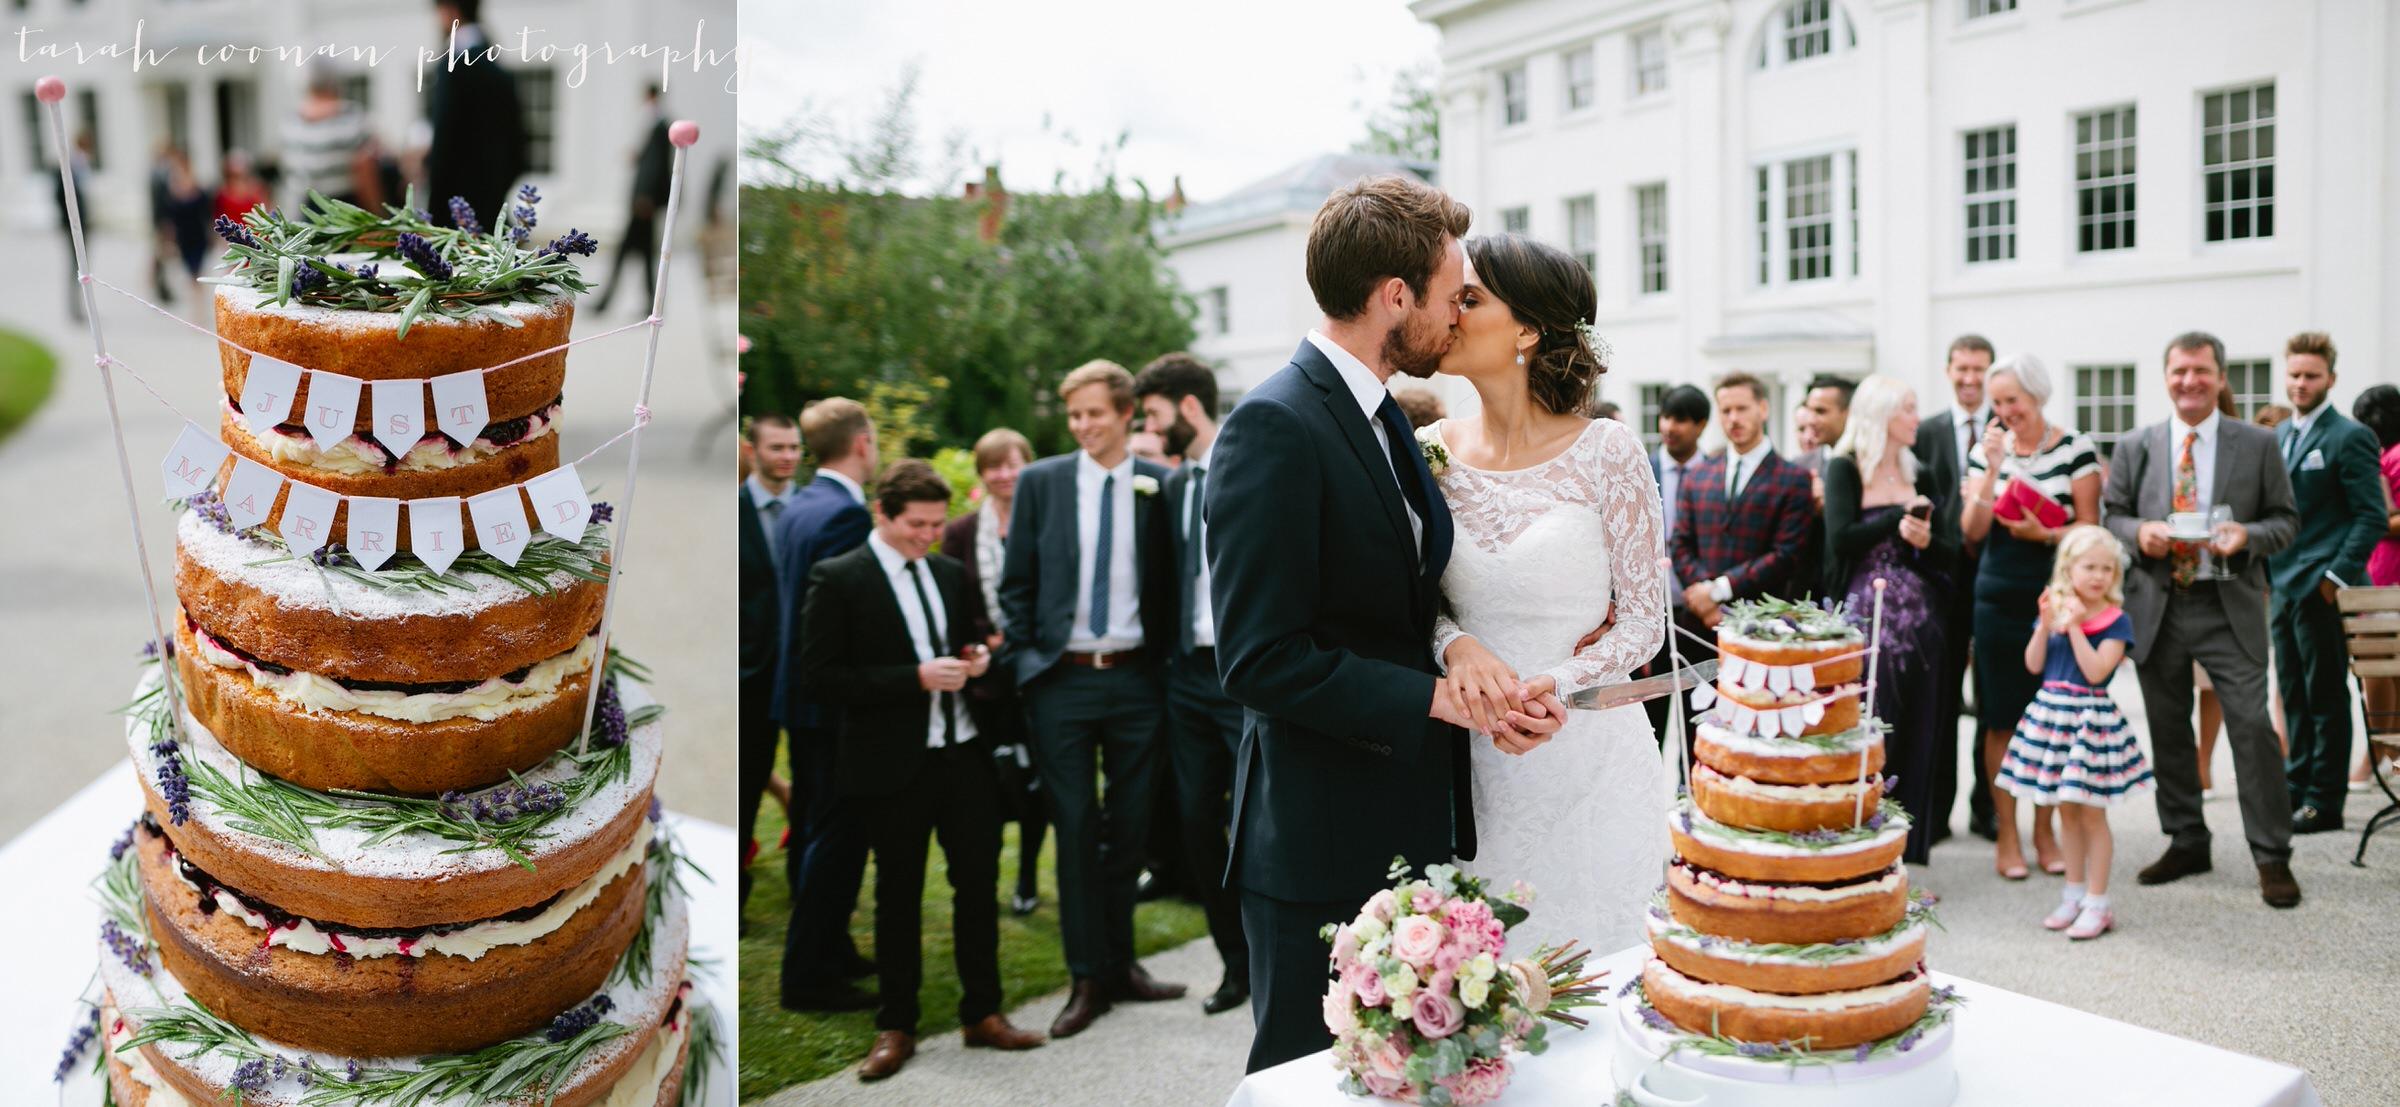 birmingham-wedding-photographer_062